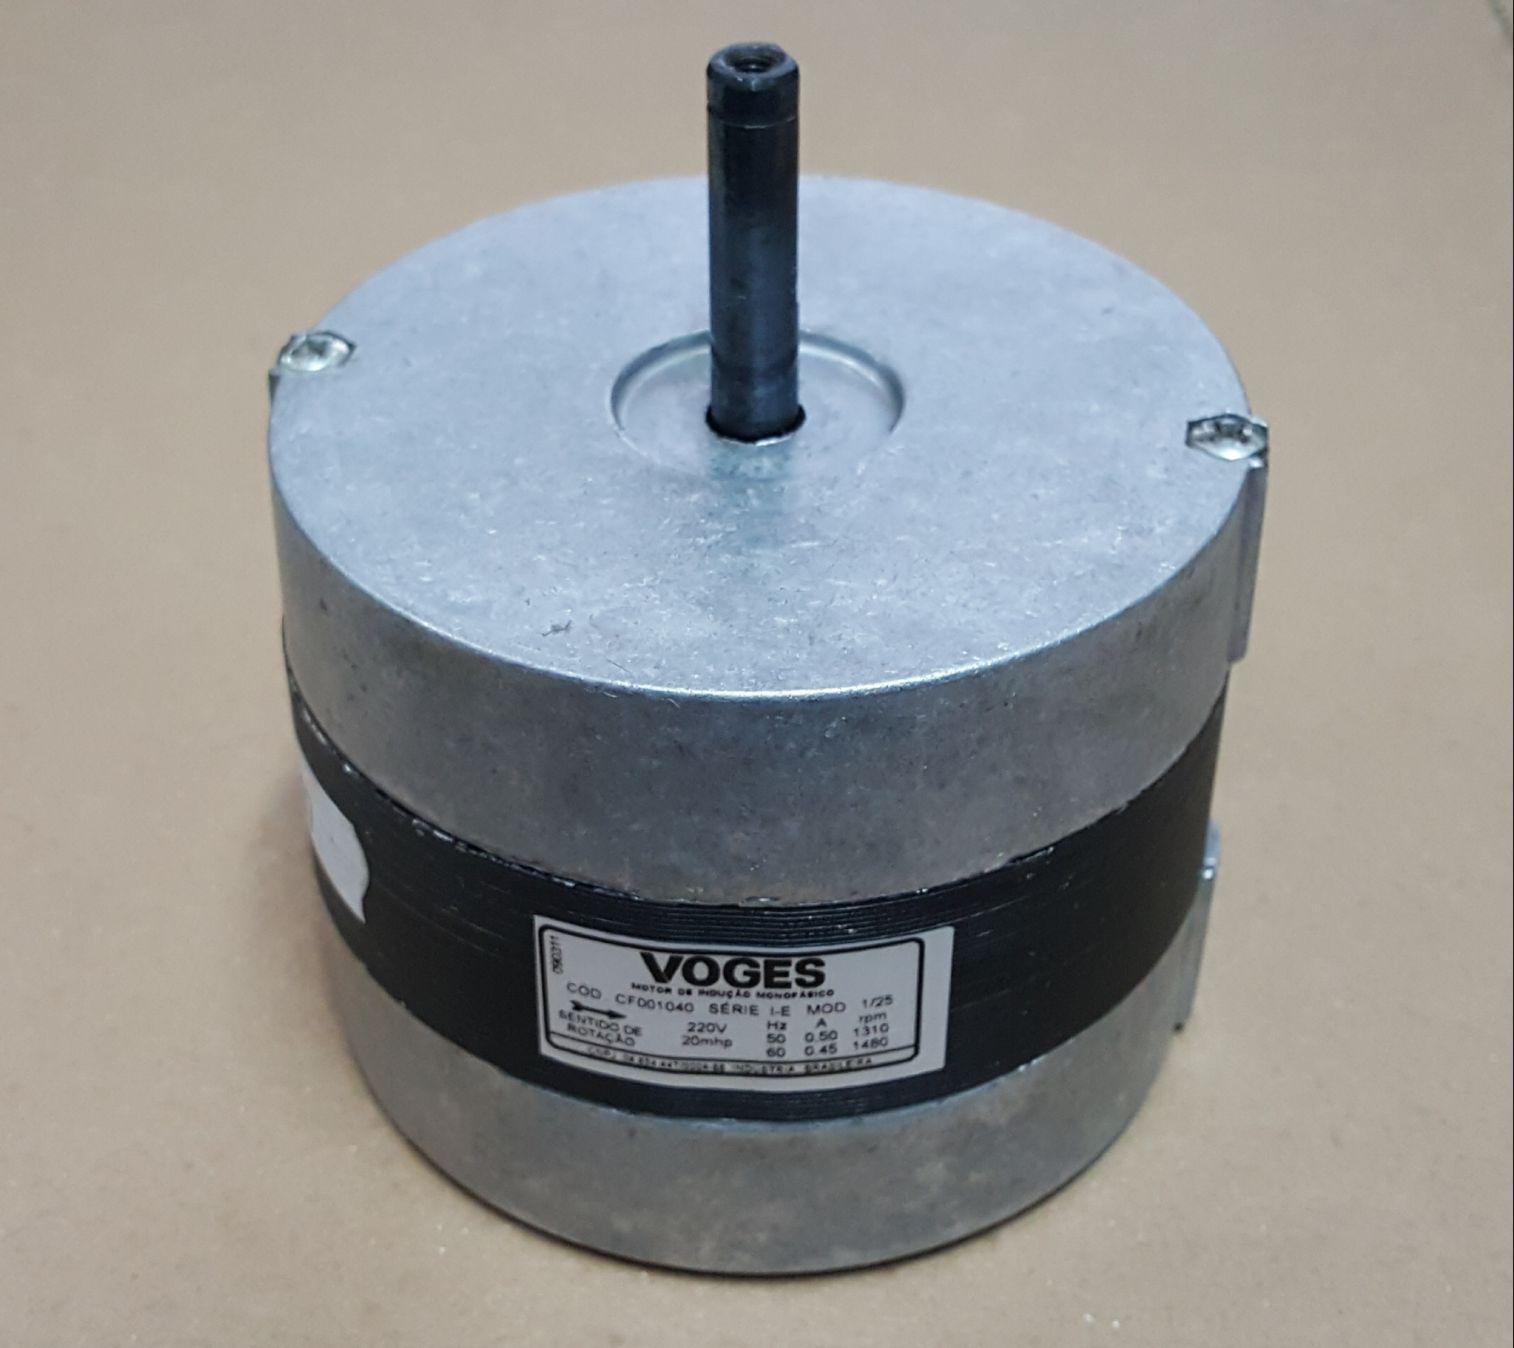 Micro Motor Monofásico 1/25 HP - Voges - 220v - (sem hélice)